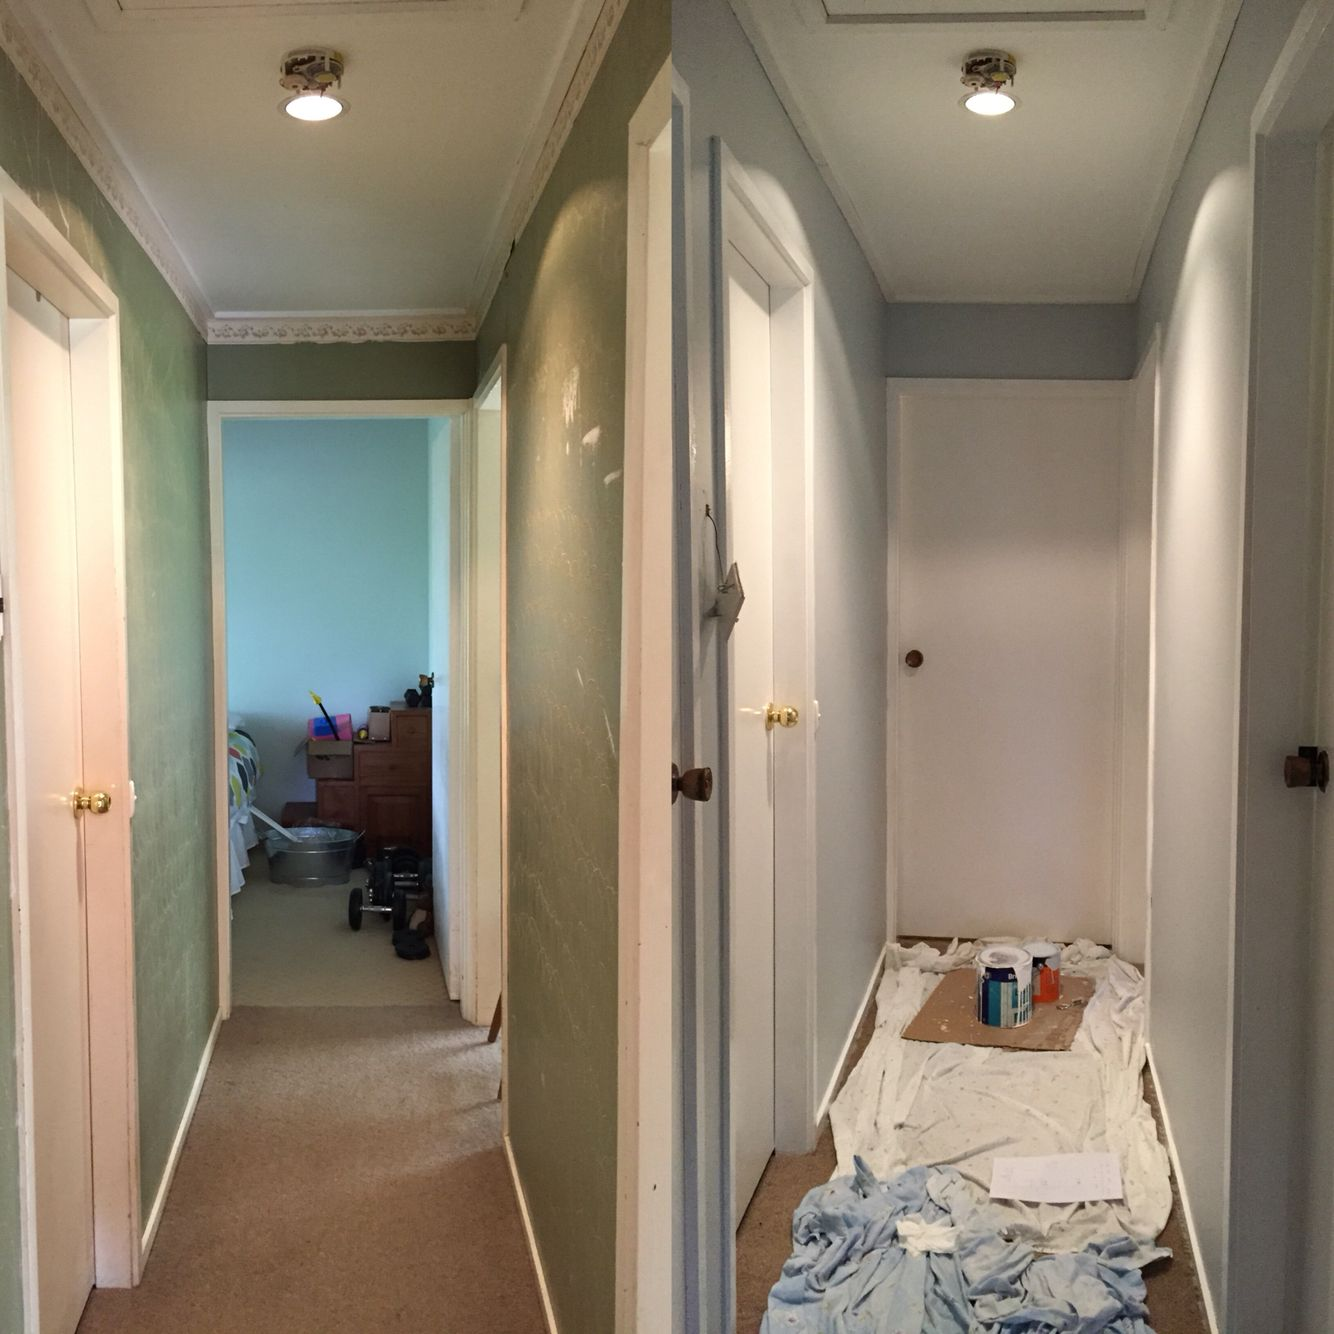 hallway before after dulux grey pail paint colours. Black Bedroom Furniture Sets. Home Design Ideas